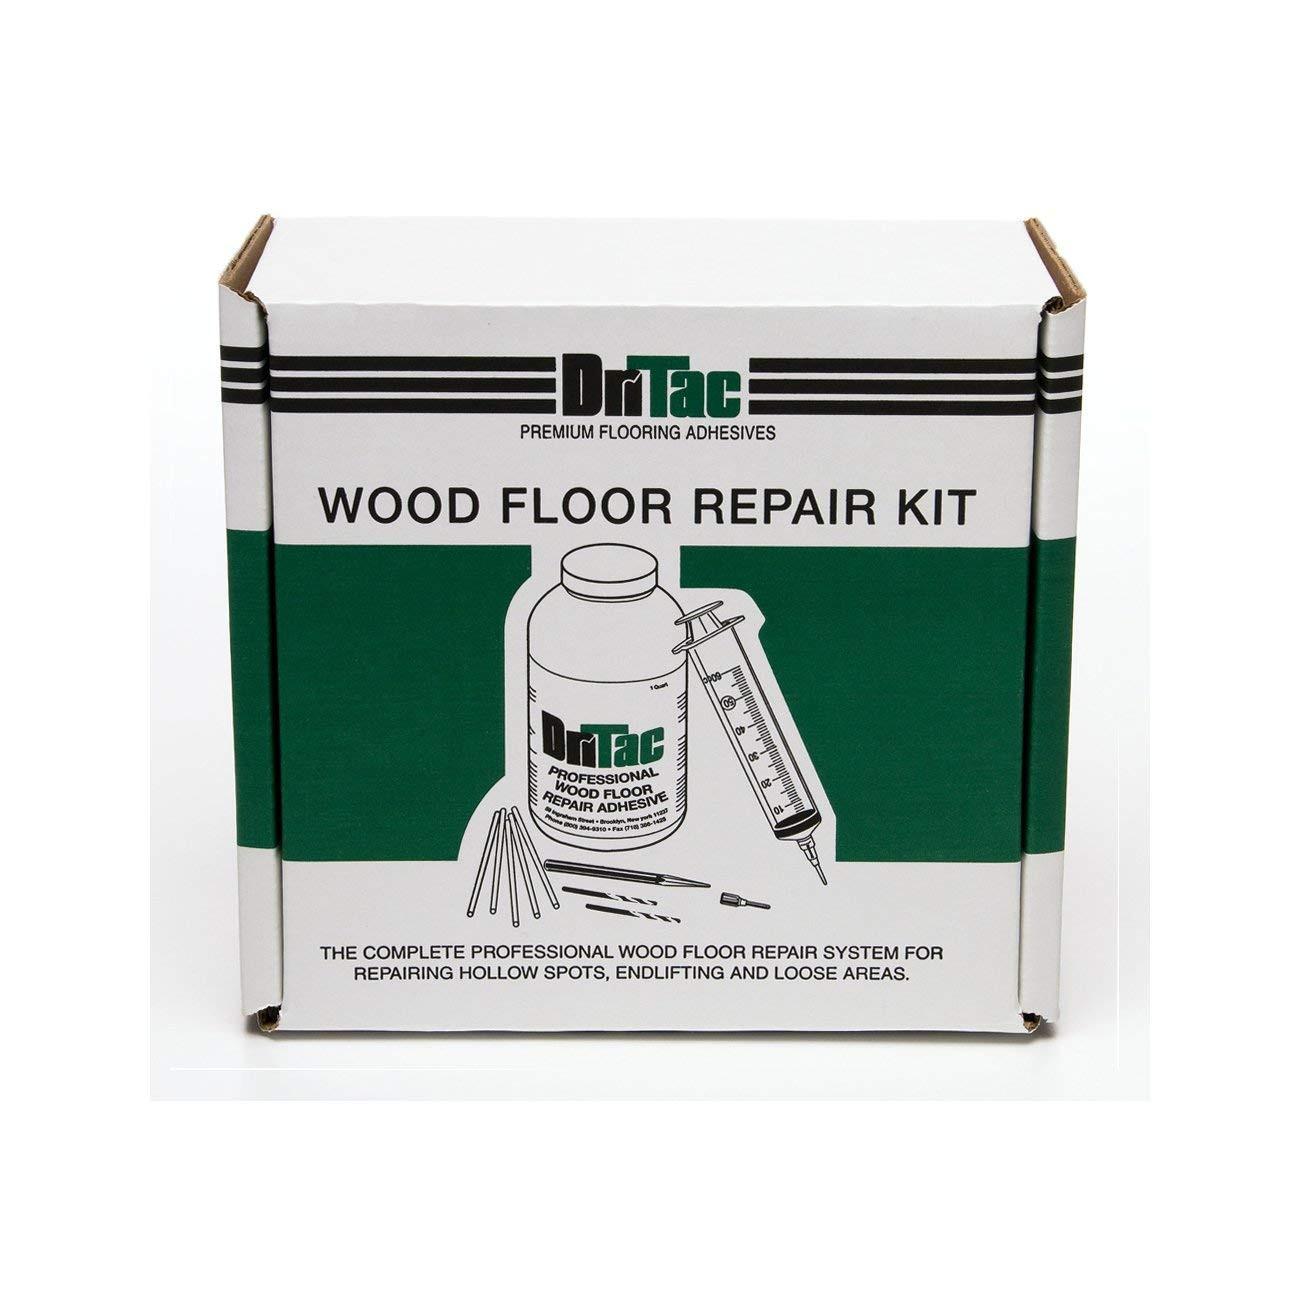 hardwood floor gap filler products of amazon com dritac wood floor repair kit engineered flooring only within amazon com dritac wood floor repair kit engineered flooring only 32oz home kitchen